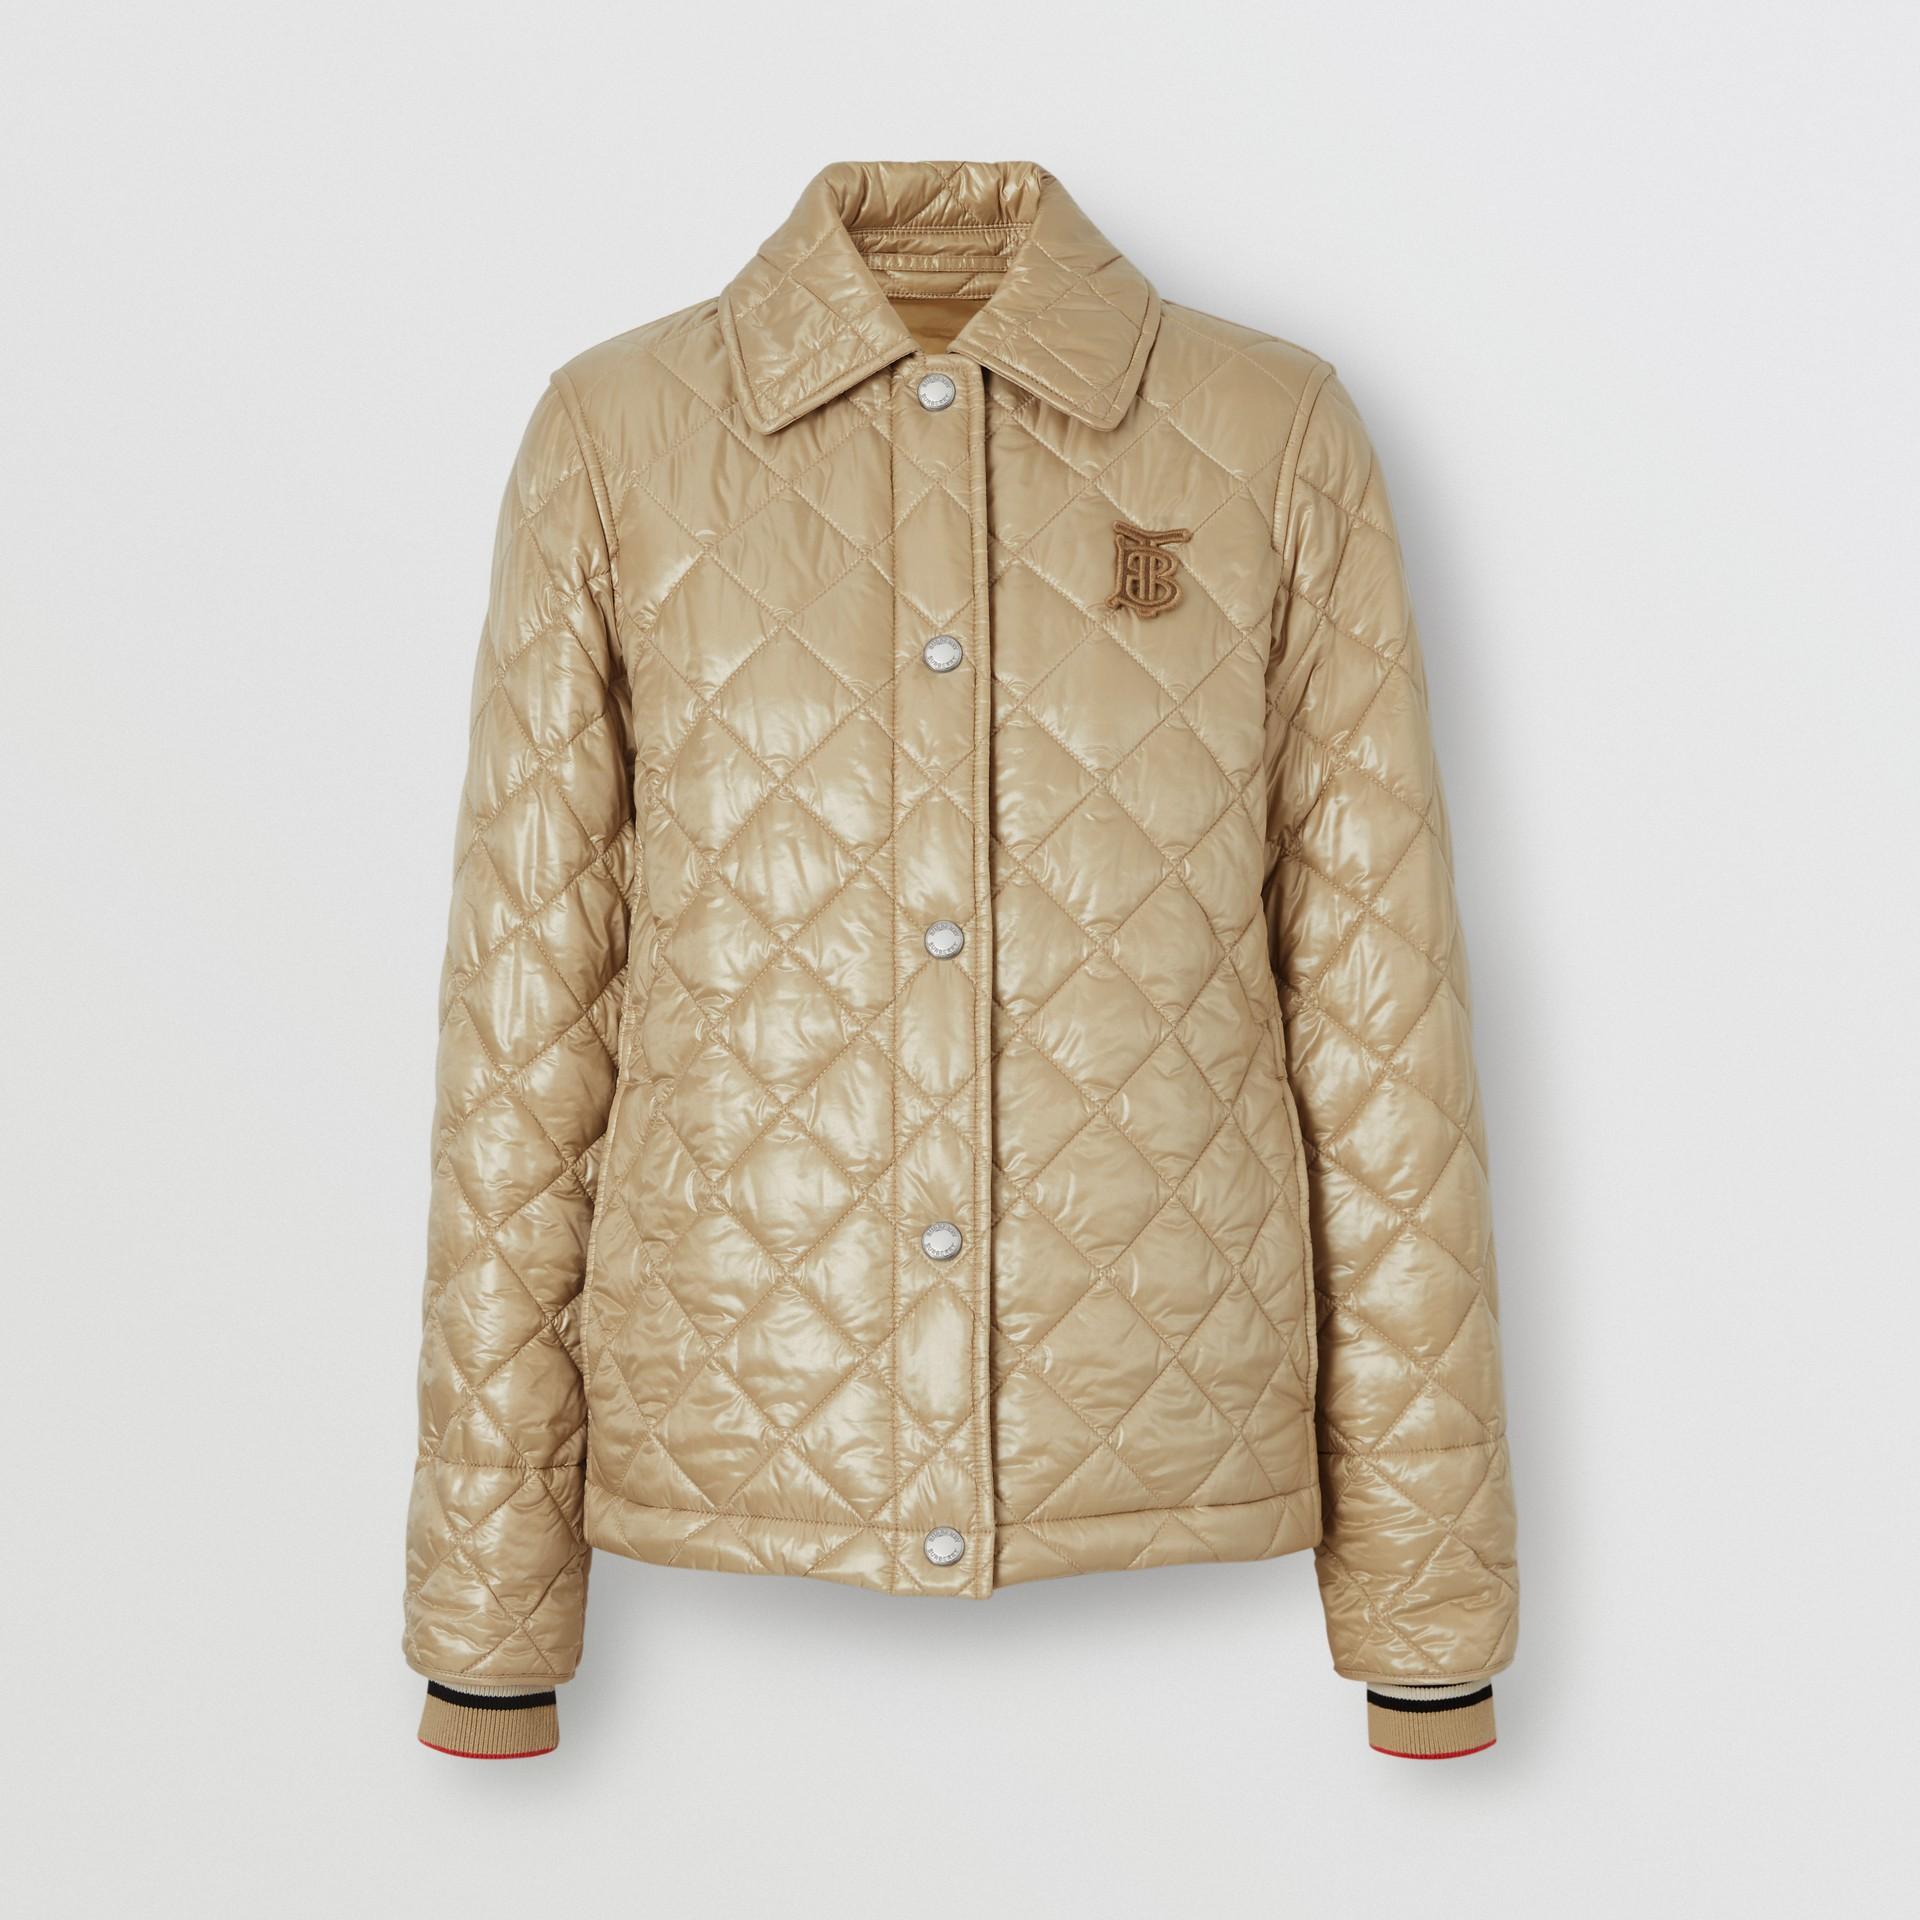 Monogram Motif Diamond Quilted Jacket in Honey - Women | Burberry Hong Kong - gallery image 3